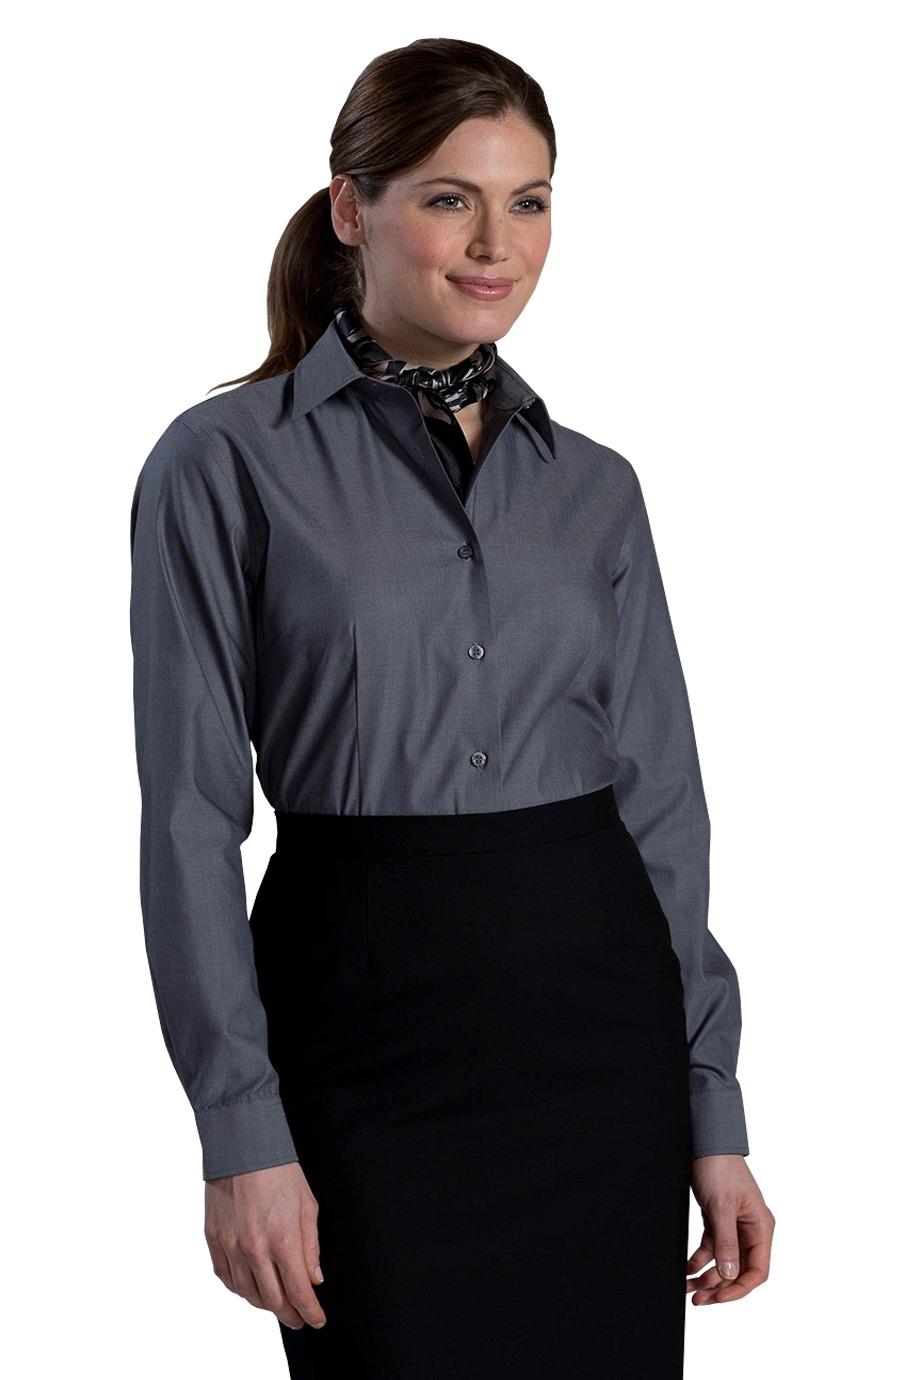 Edwards Garment 5978 - Women's No-Iron Stay Collar Dress Shirt